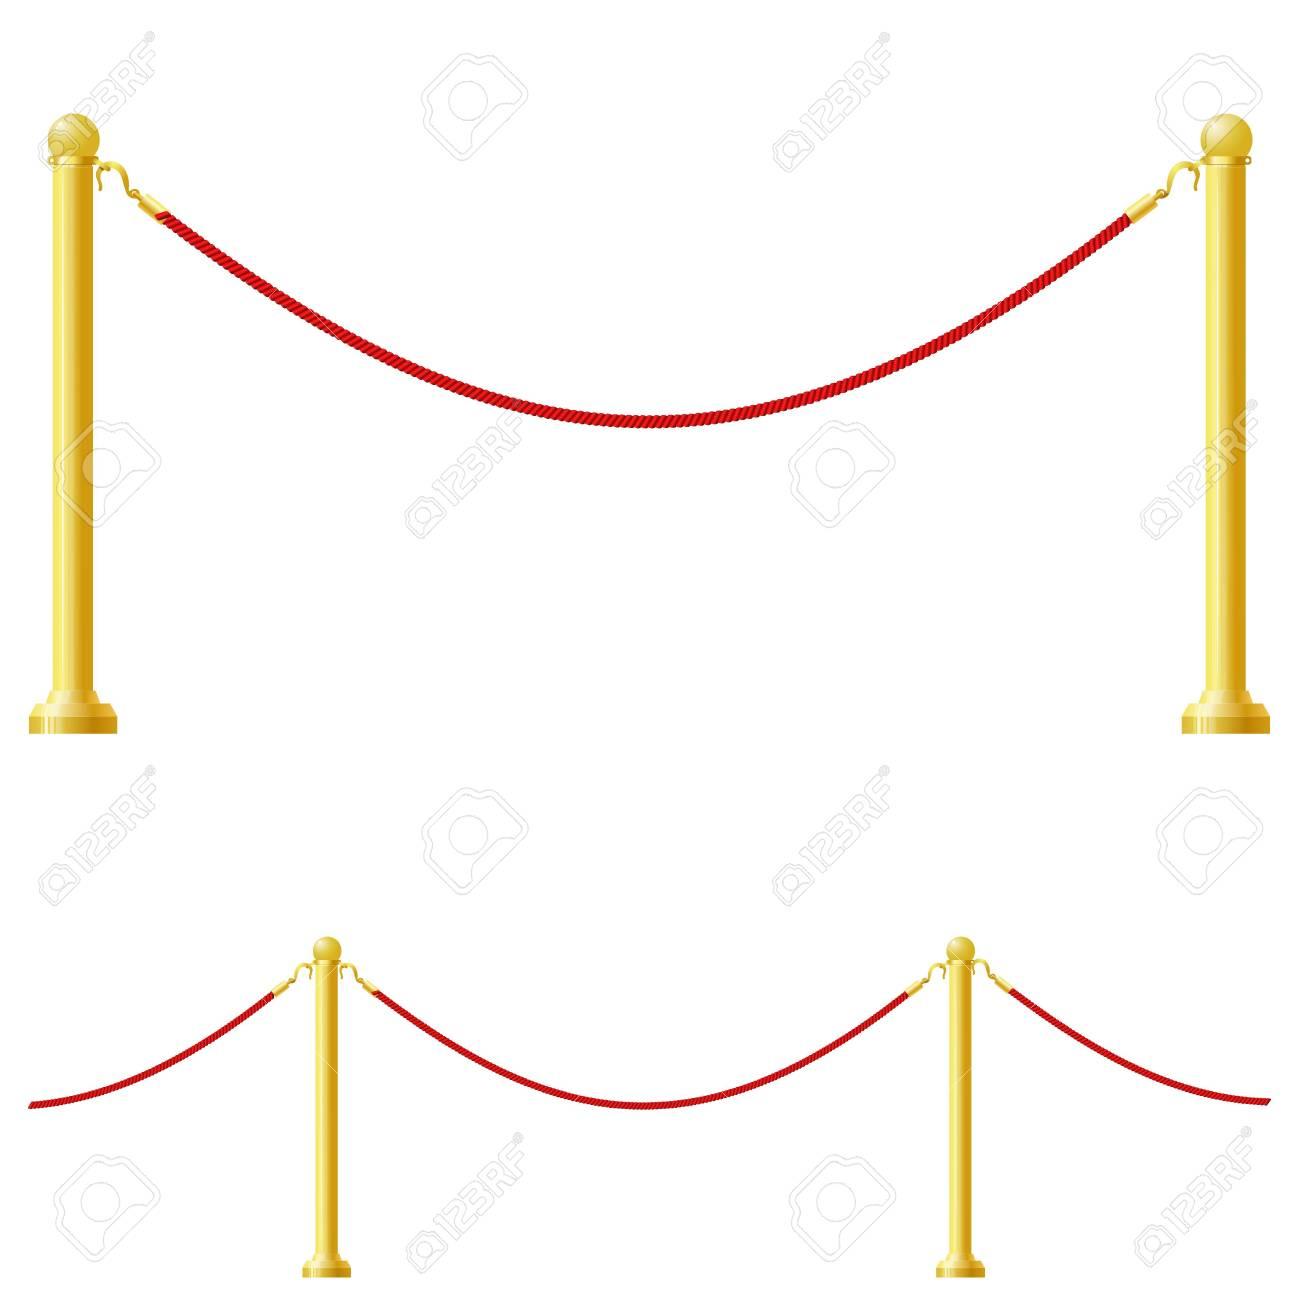 Vector illustration of a barrier Stock Vector - 11943099